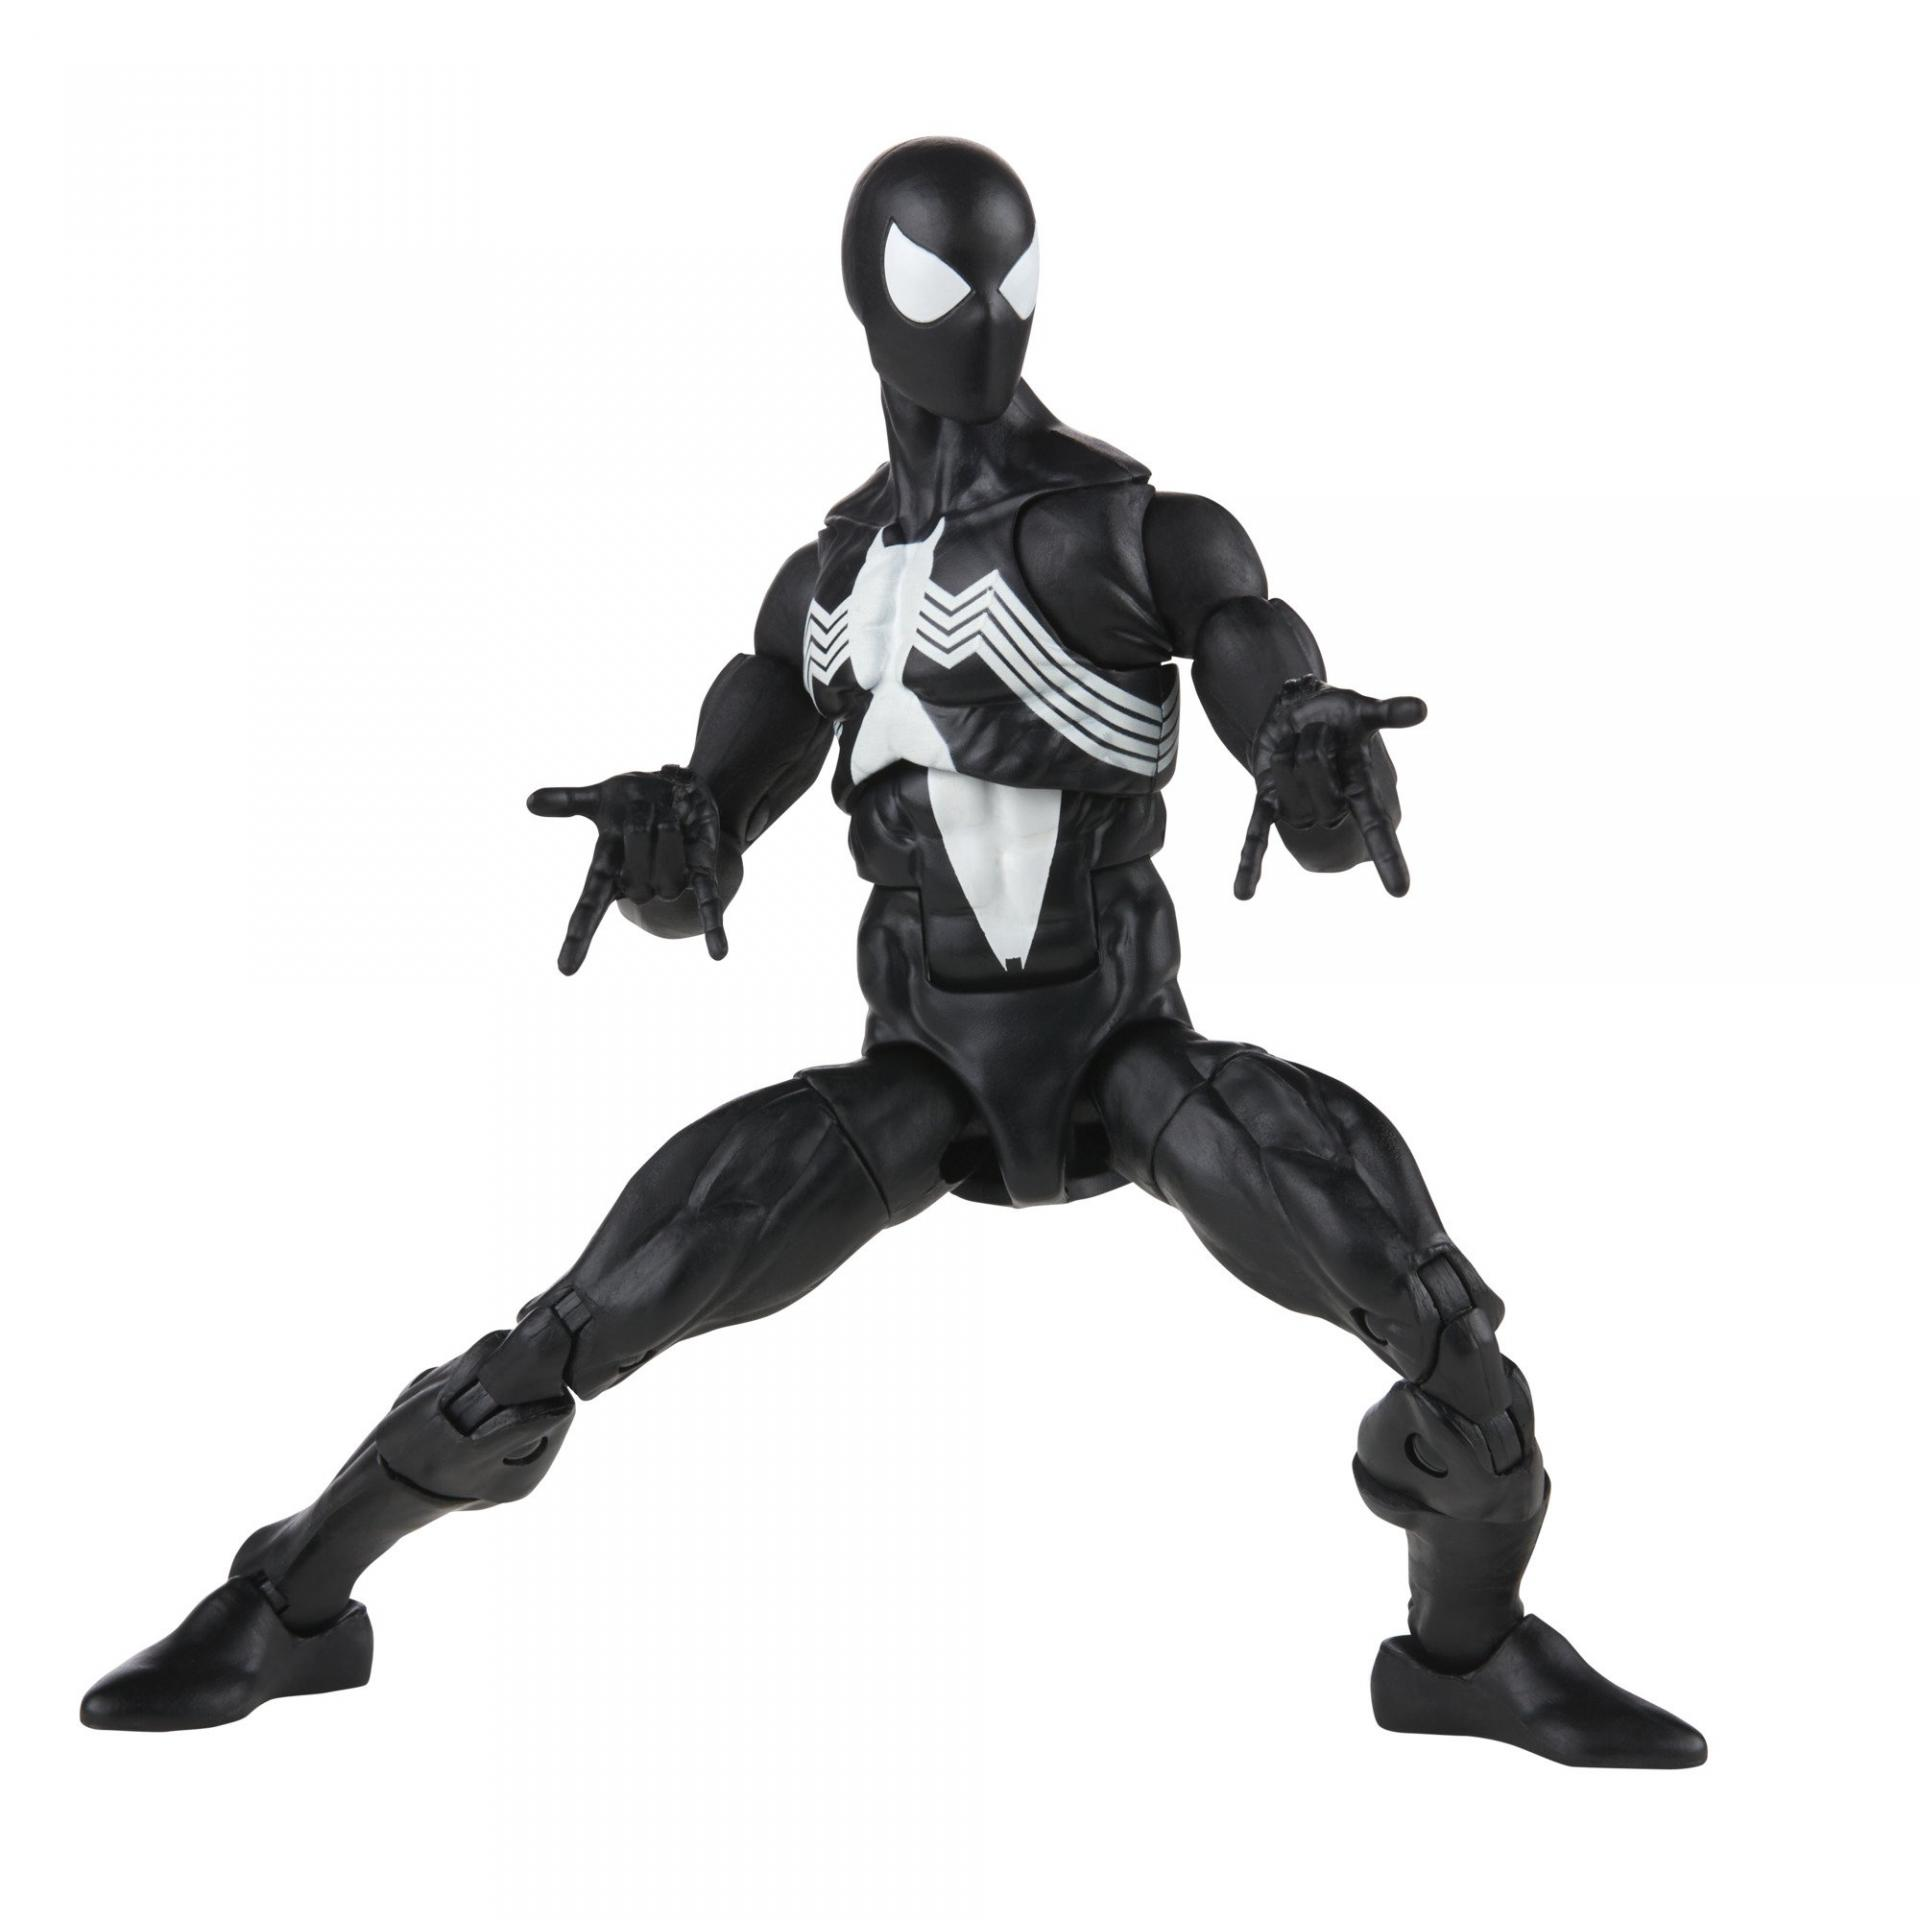 Marvel legends series hasbro symbiote spider man6